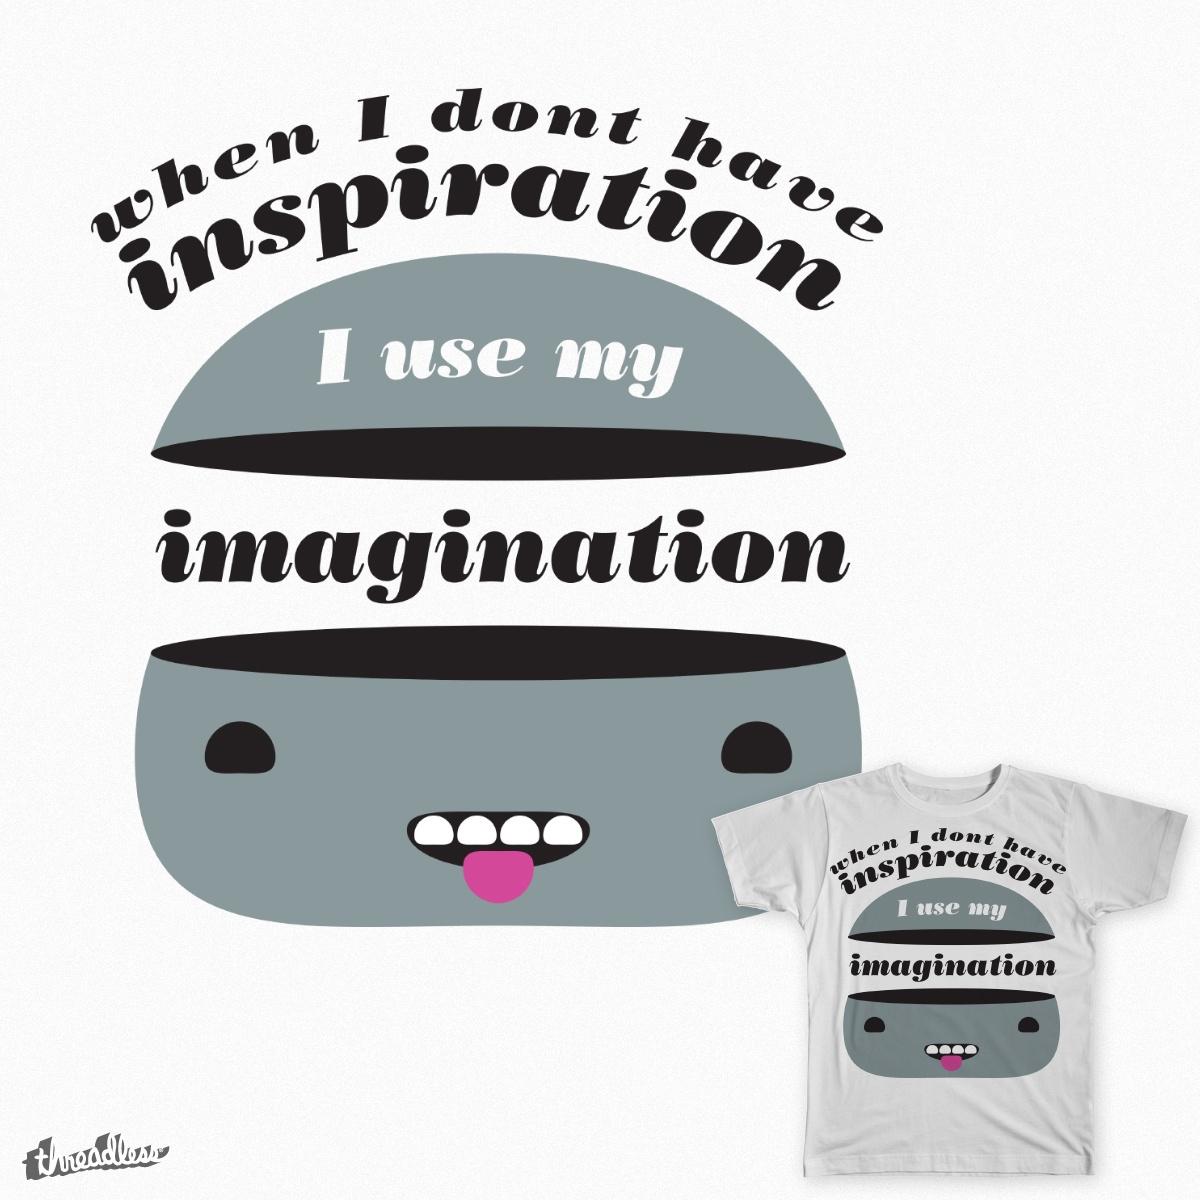 Imagi-NATION by Imagi-Nation on Threadless